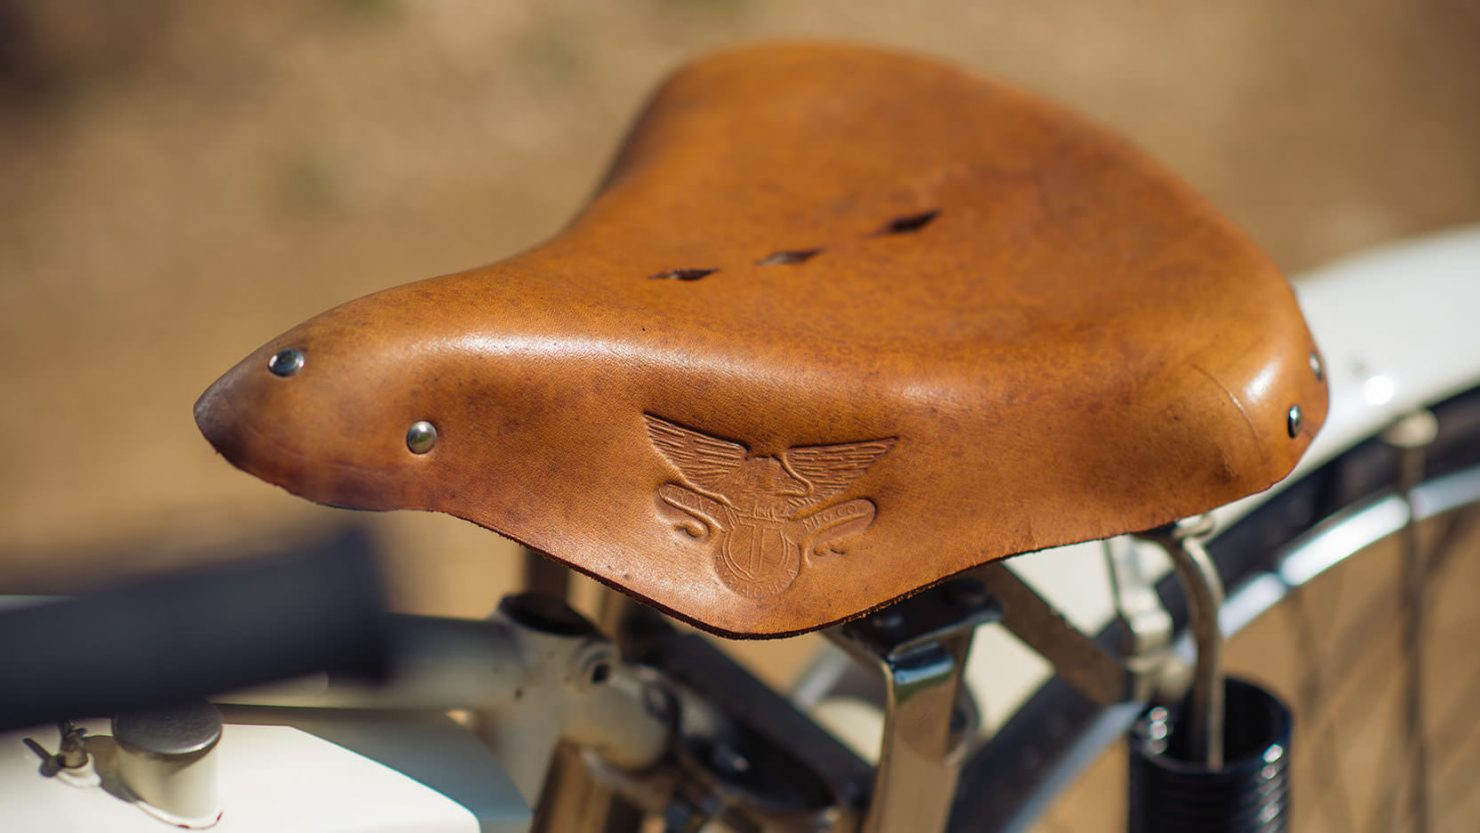 Thor Single Motorcycle 3 1480x833